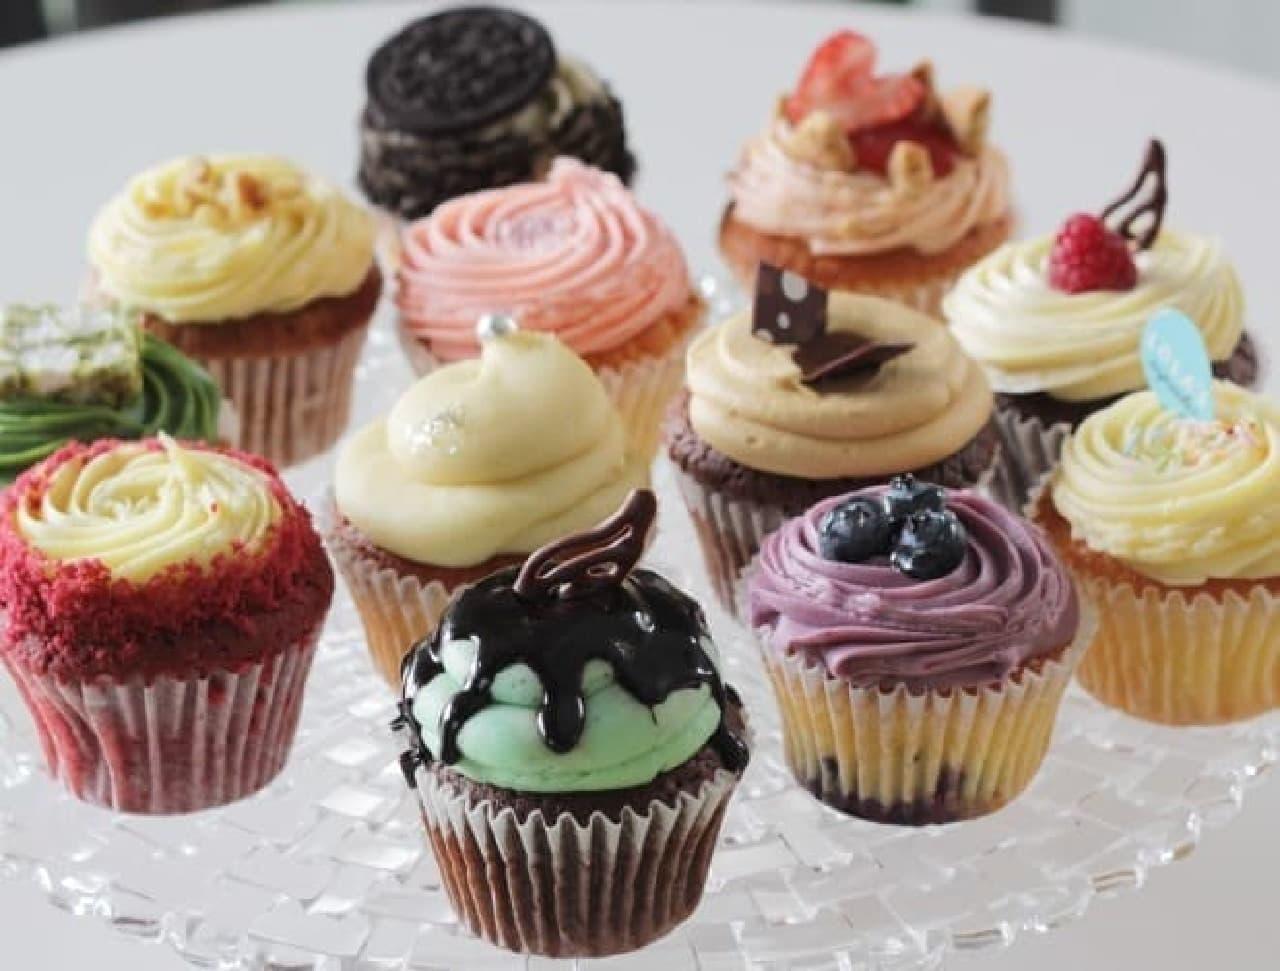 LOLA'S Cupcakes(ローラズ・カップケーキ) カップケーキ